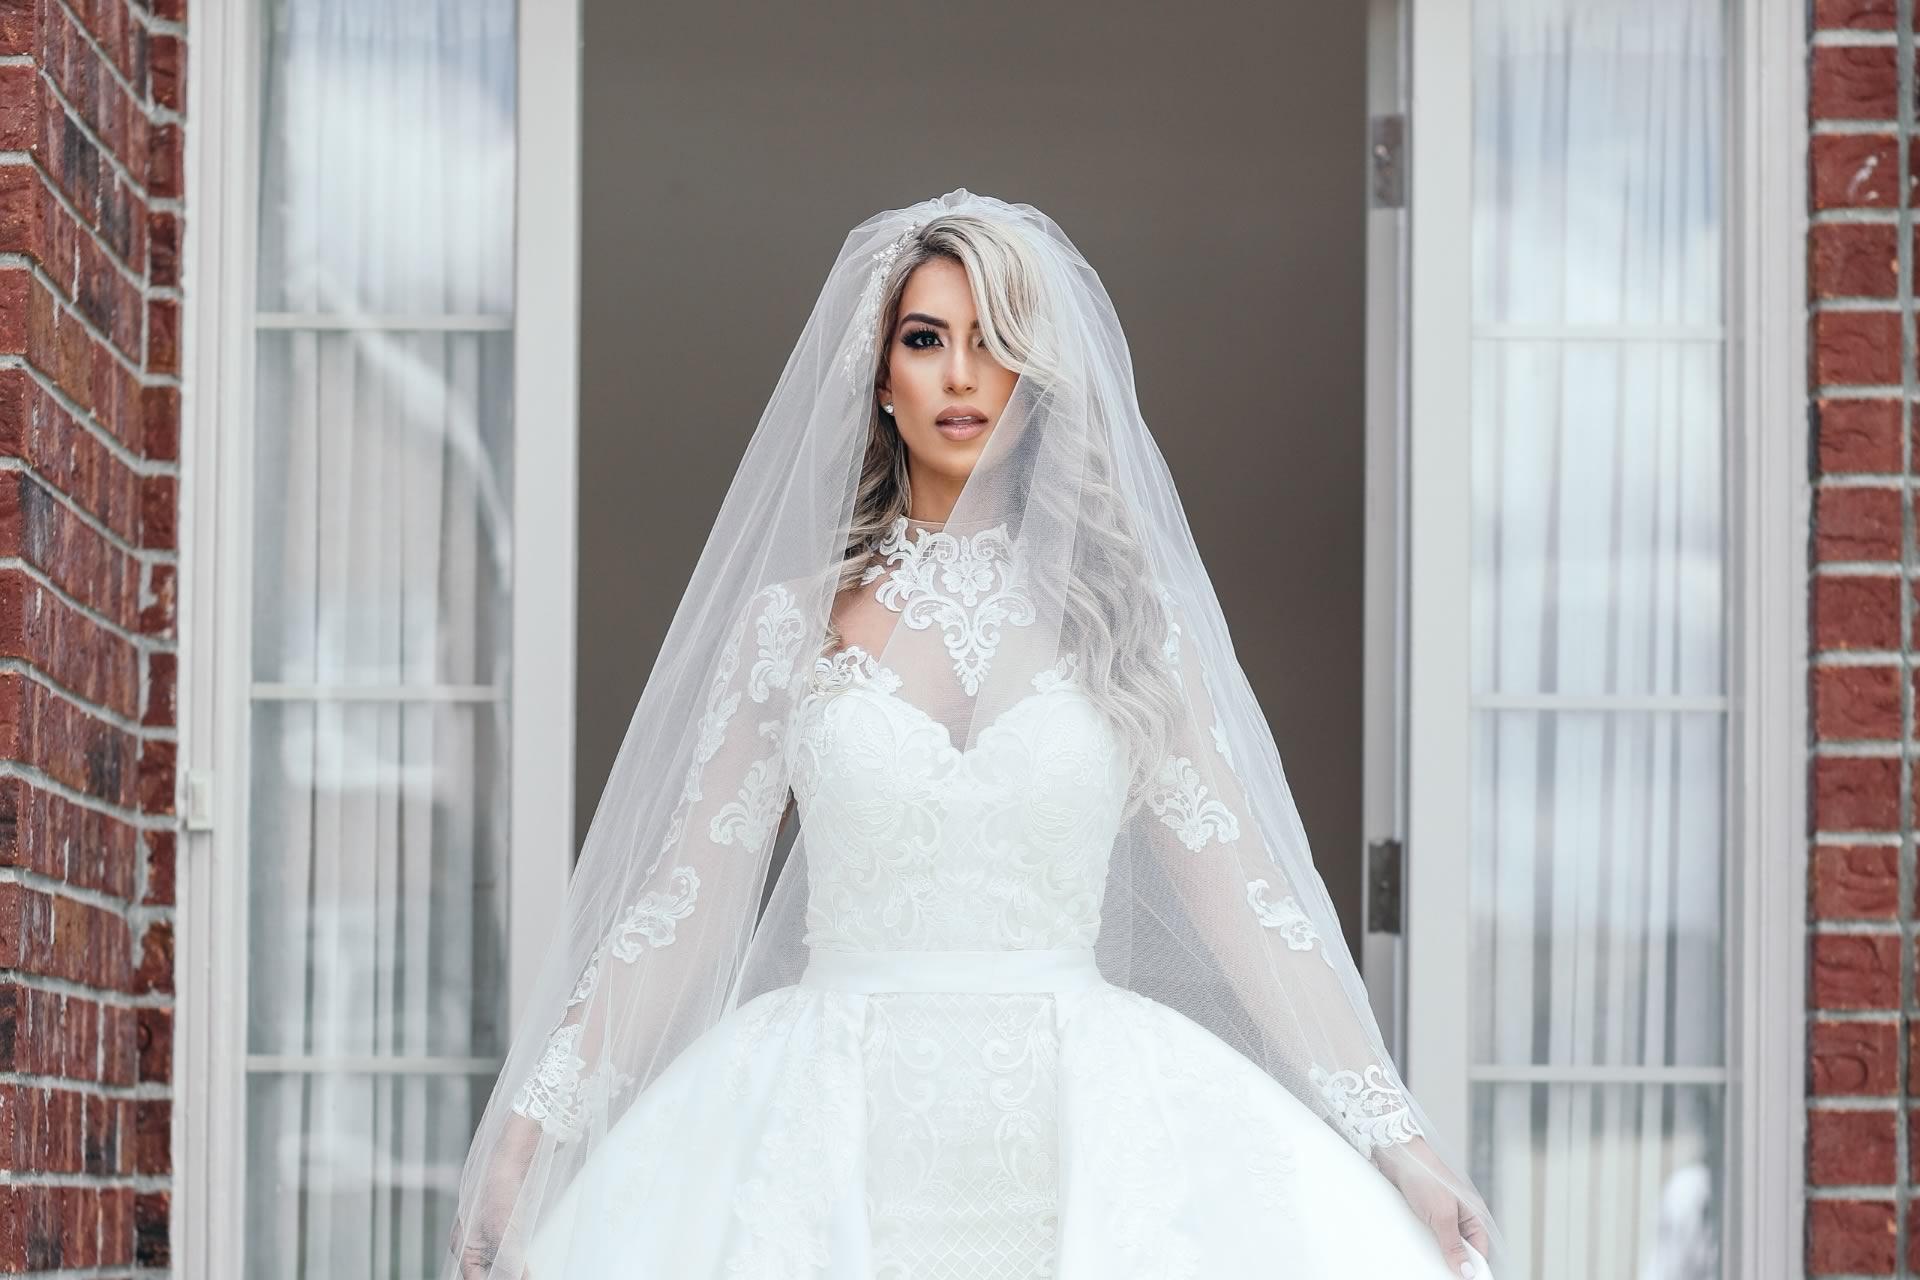 Ways To Customize Your Wedding Dress